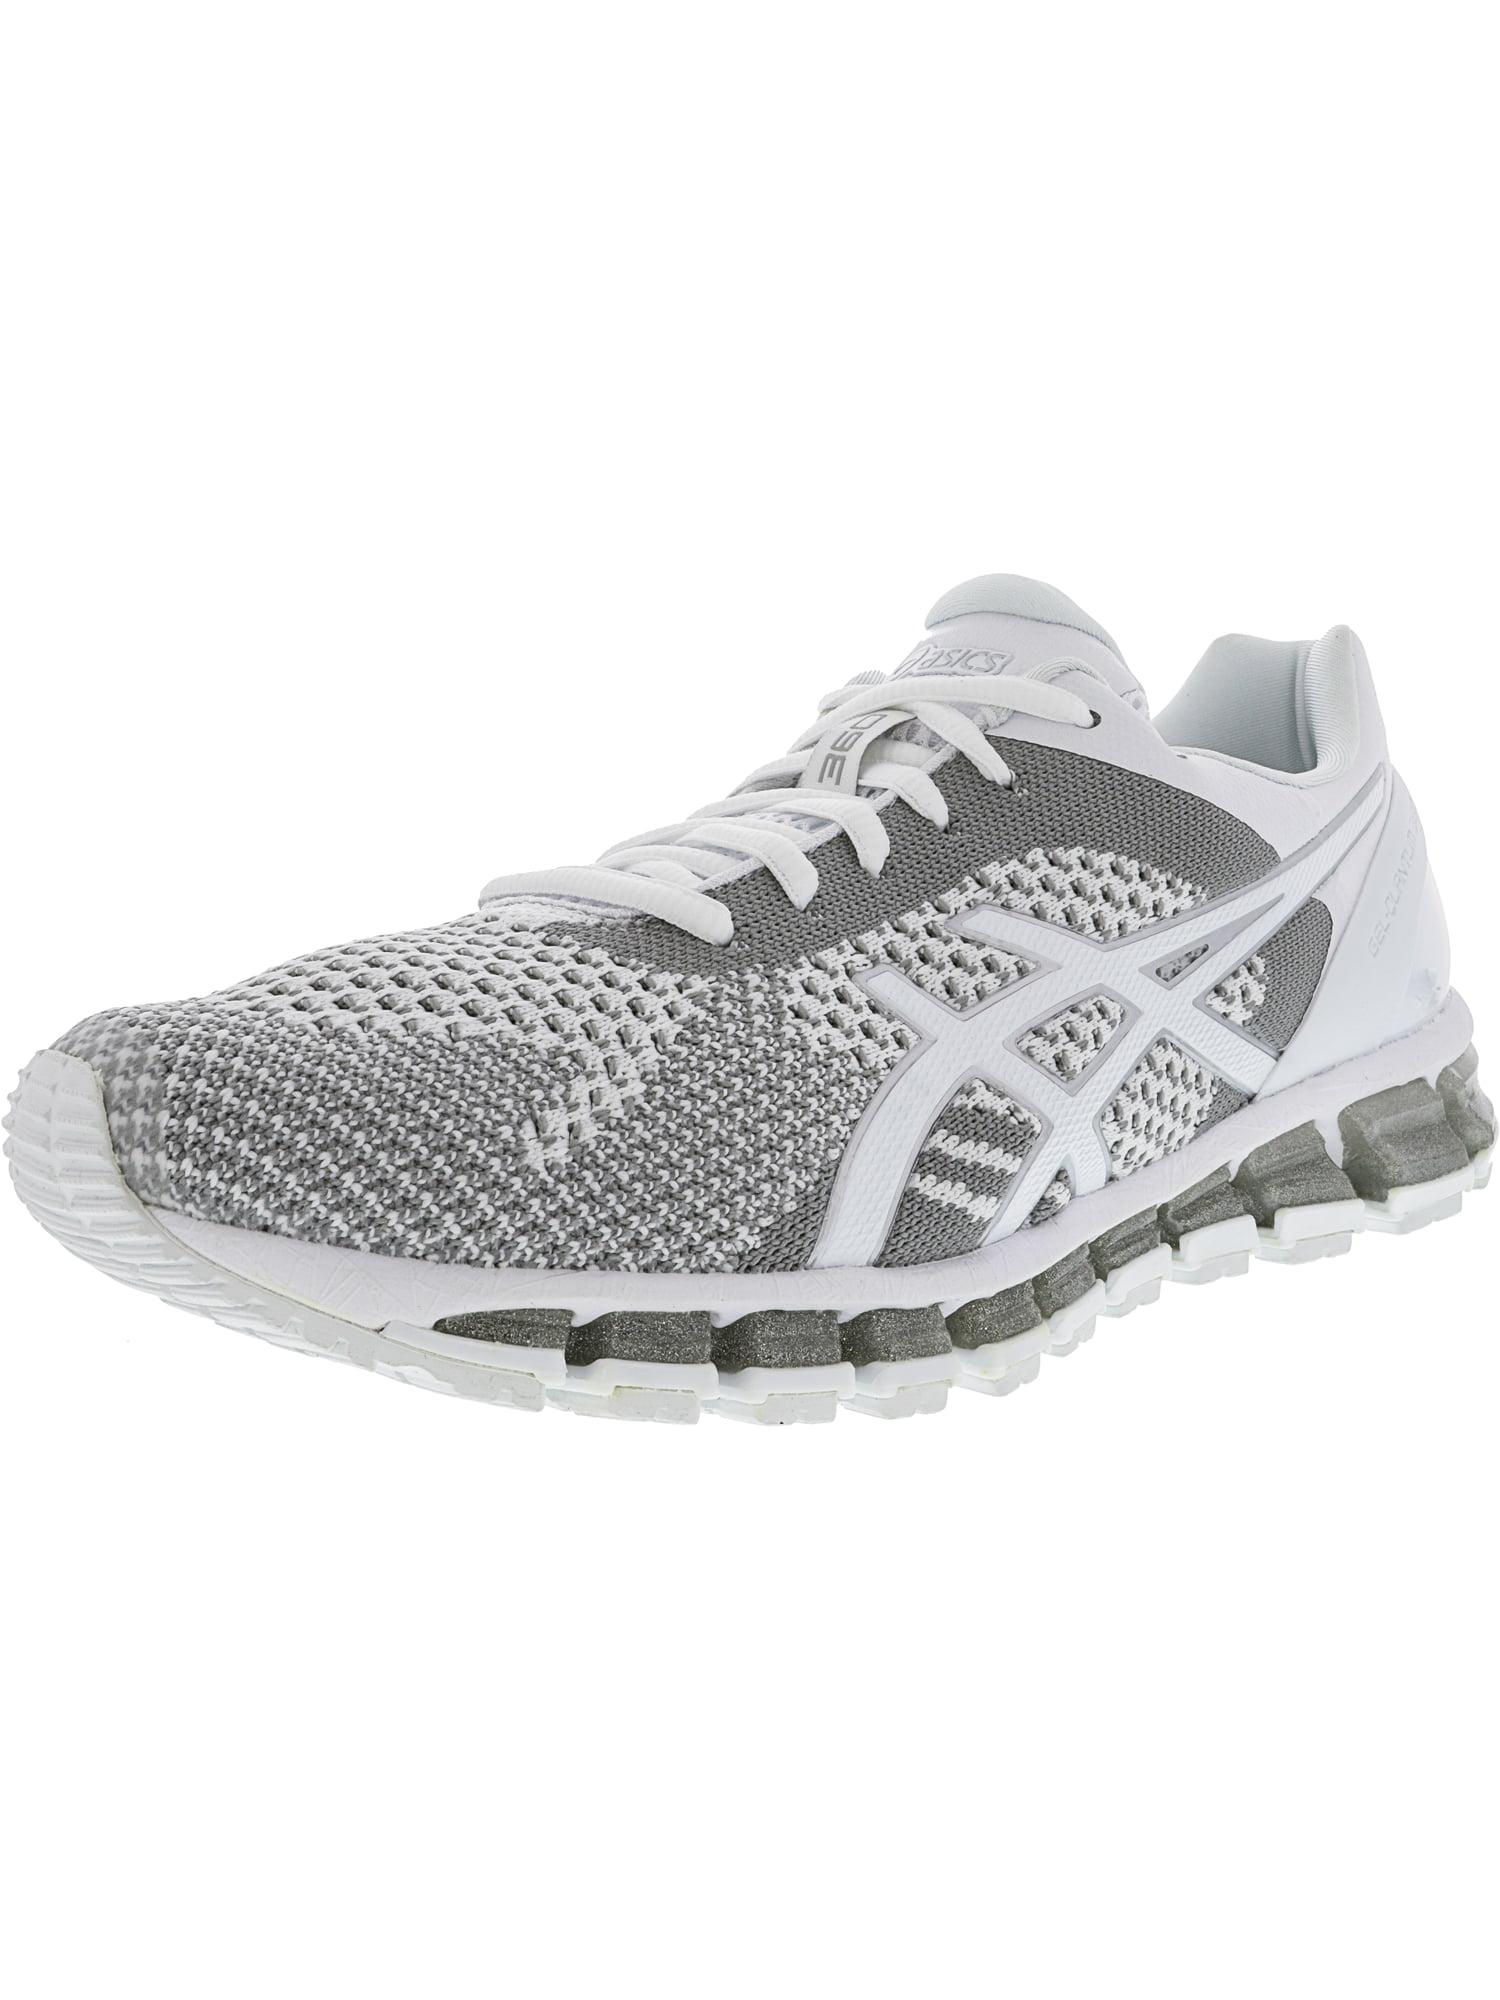 Asics Women's Gel-Quantum 360 White / Snow Silver Ankle-High Running Shoe - 9M